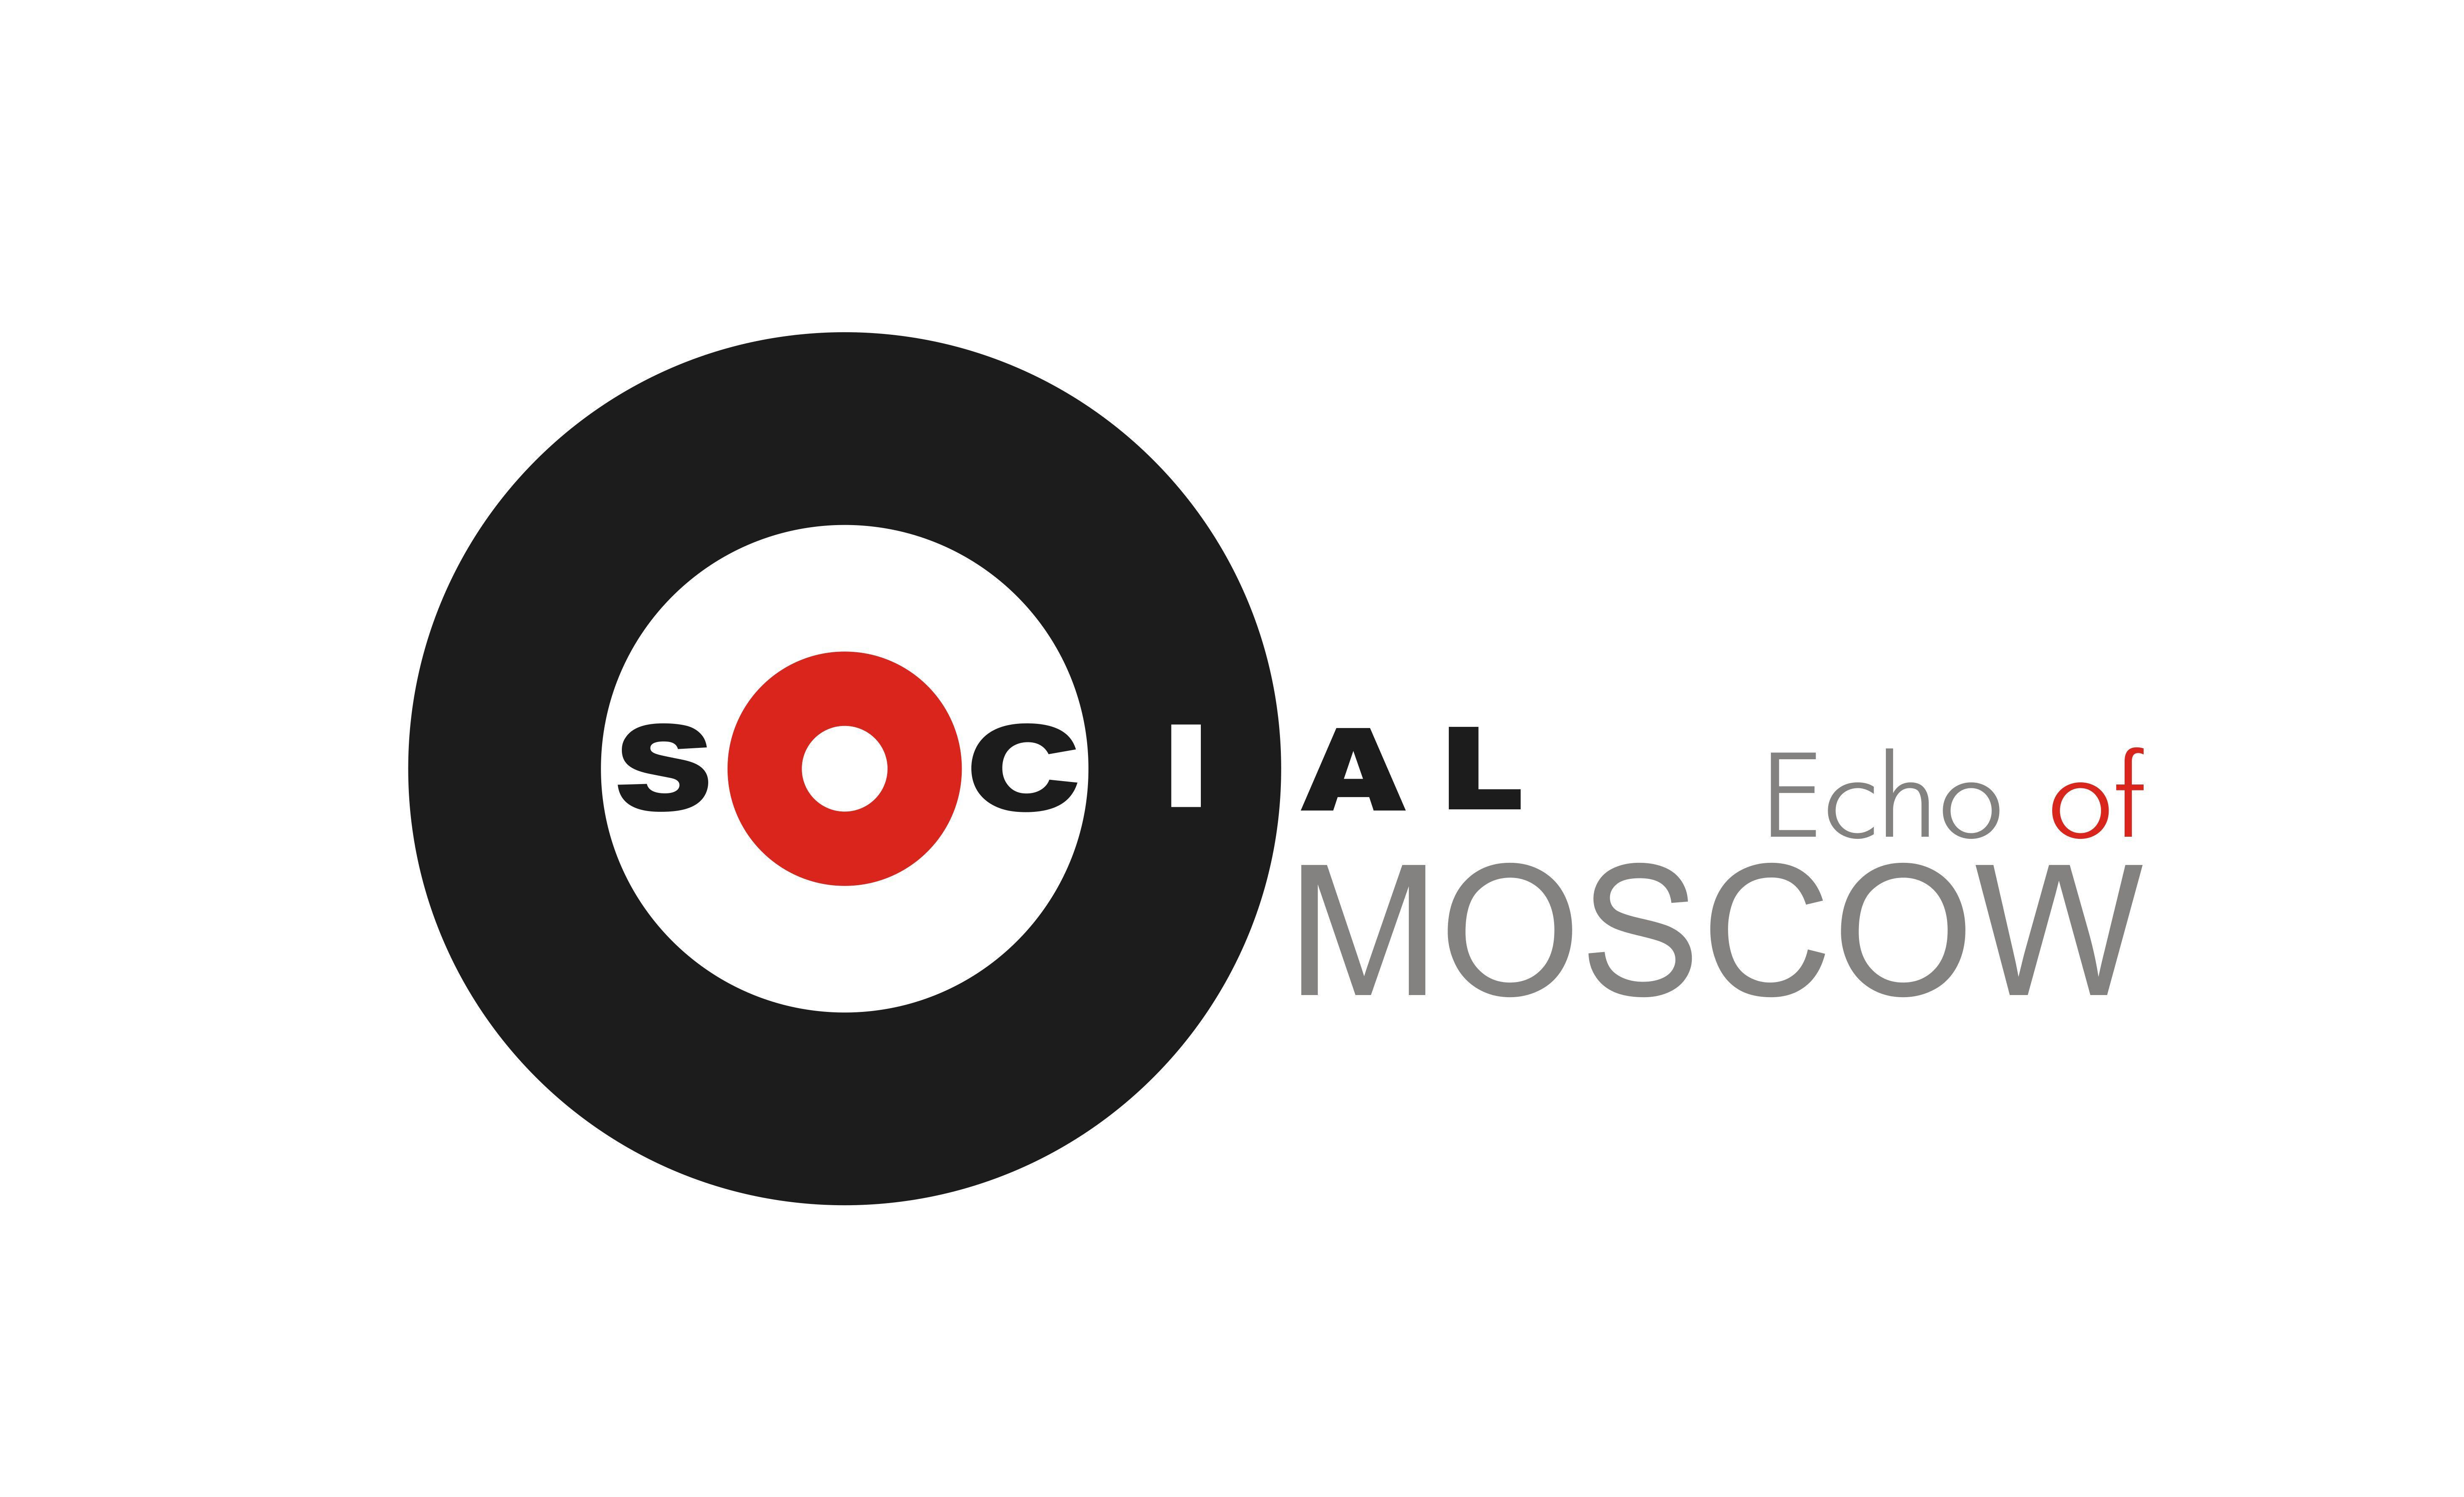 Дизайн логотипа р/с Эхо Москвы. фото f_259561fd1c7a2e14.jpg